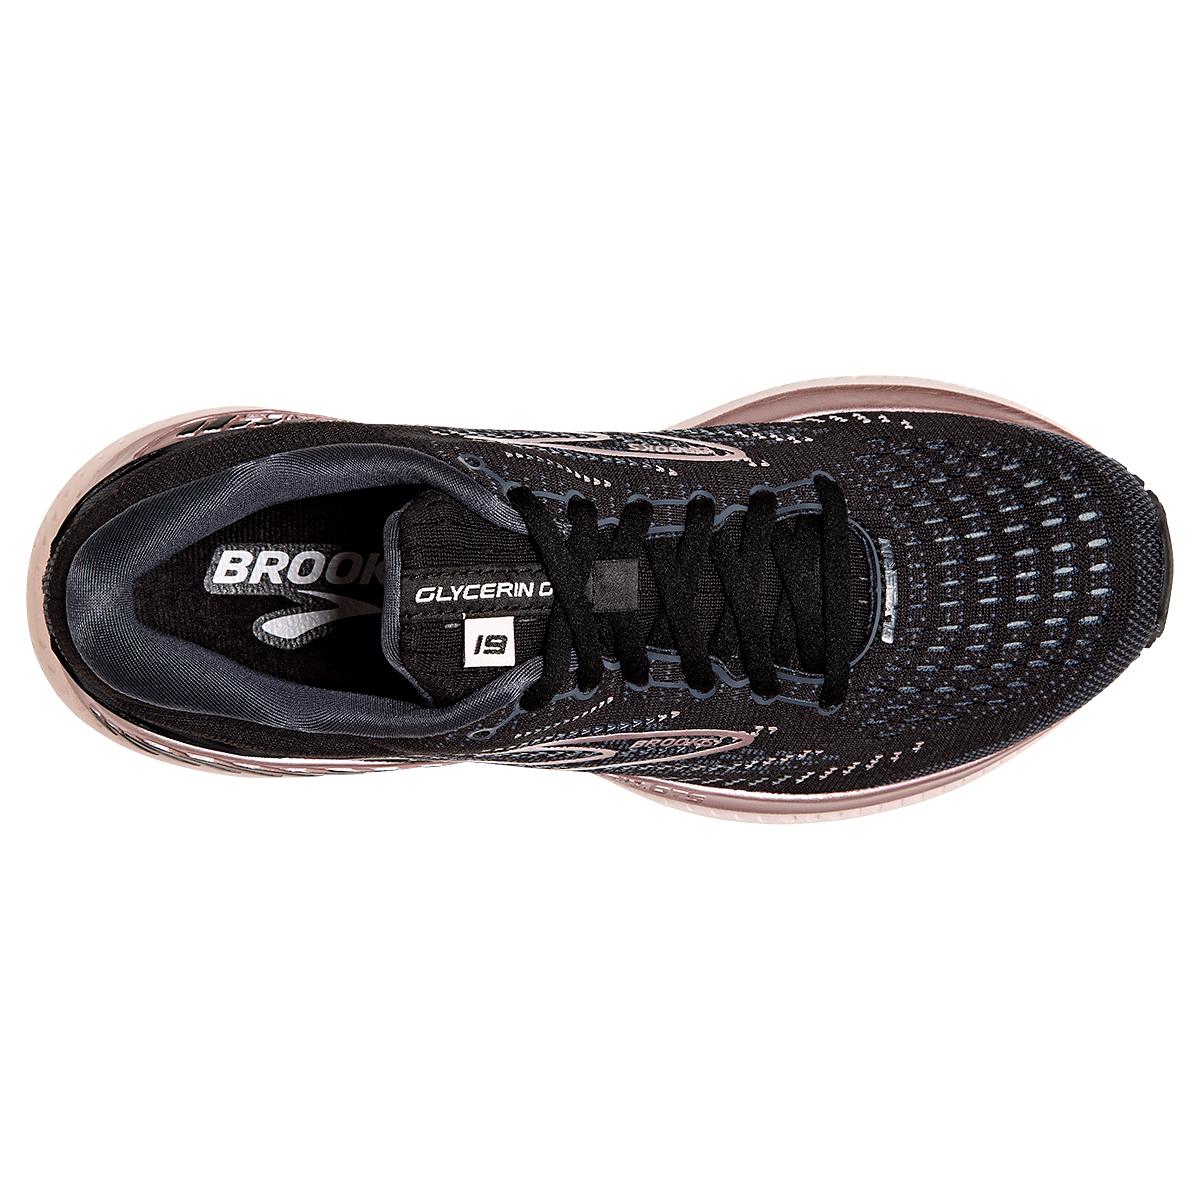 Women's Brooks Glycerin GTS 19 Running Shoe - Color: Black/Ombre/Metallic - Size: 7.5 - Width: Regular, Black/Ombre/Metallic, large, image 2